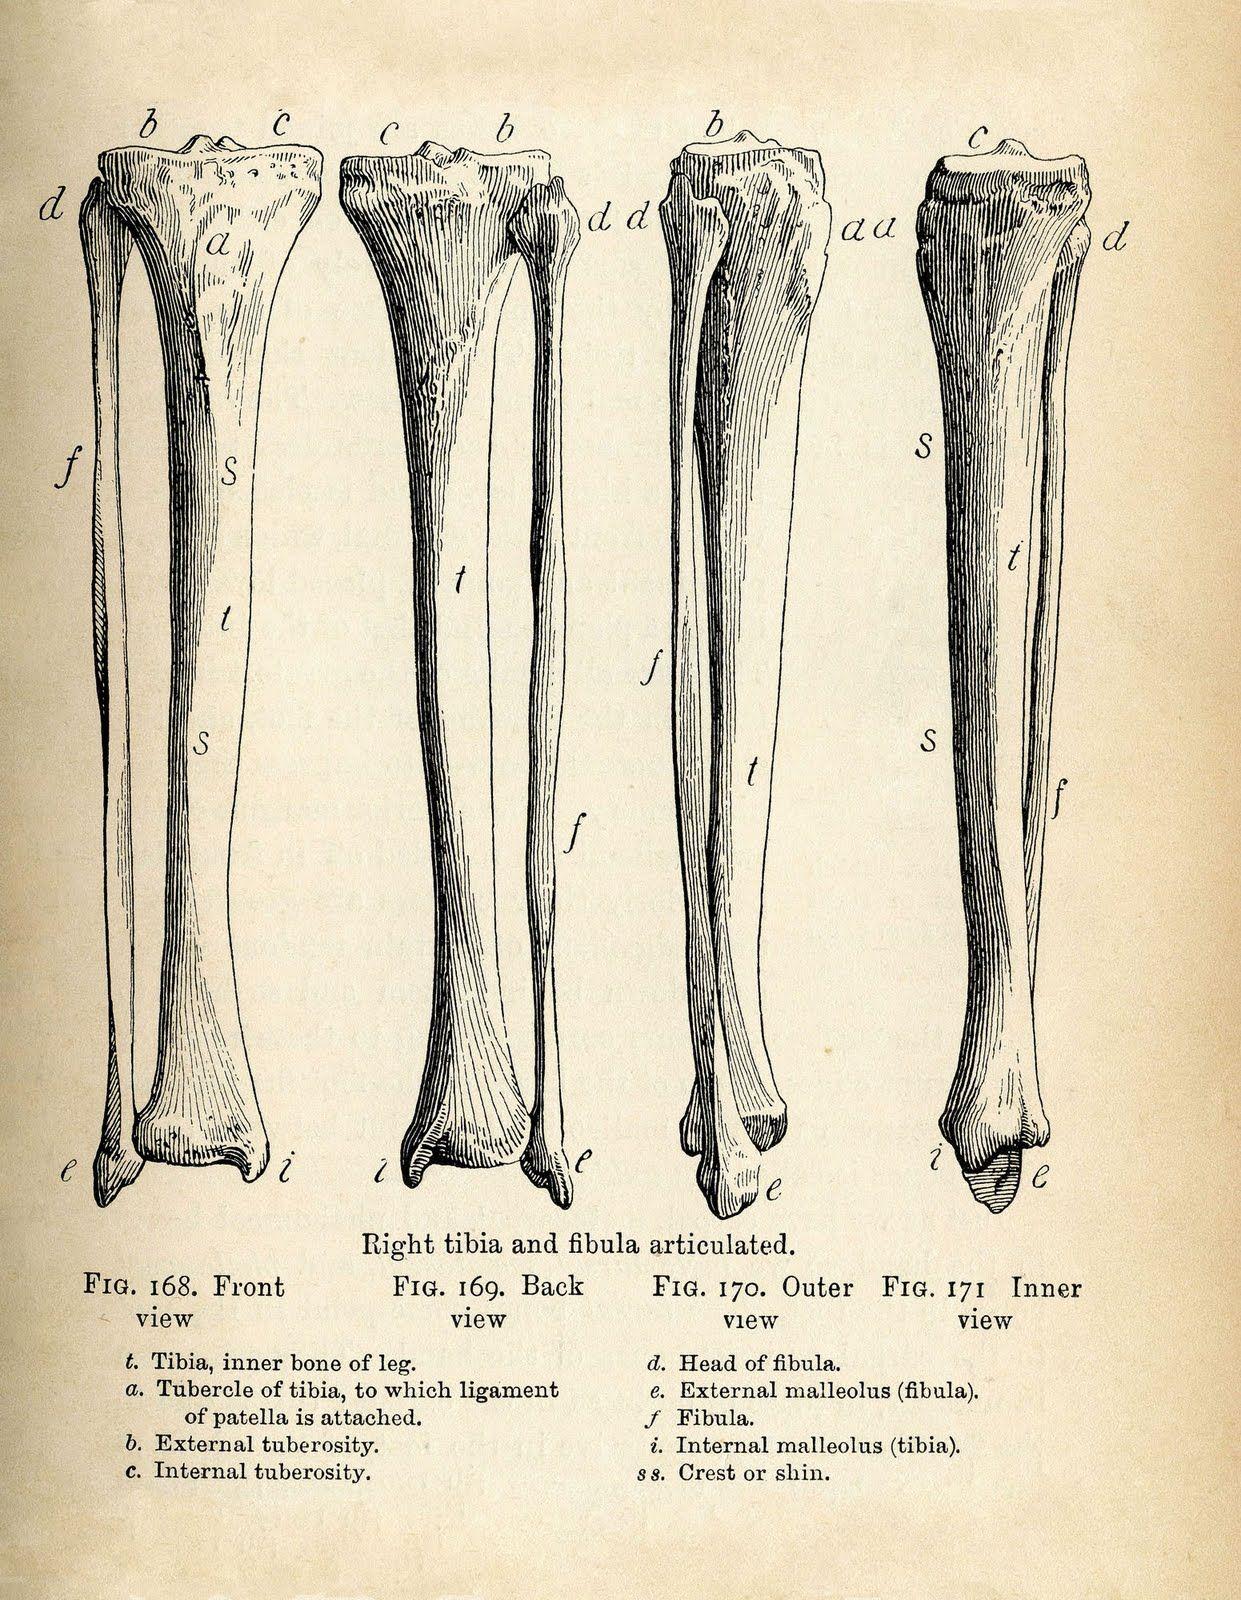 6 Skull Images - Vintage Anatomy Clip Art - Bones | halloween ...